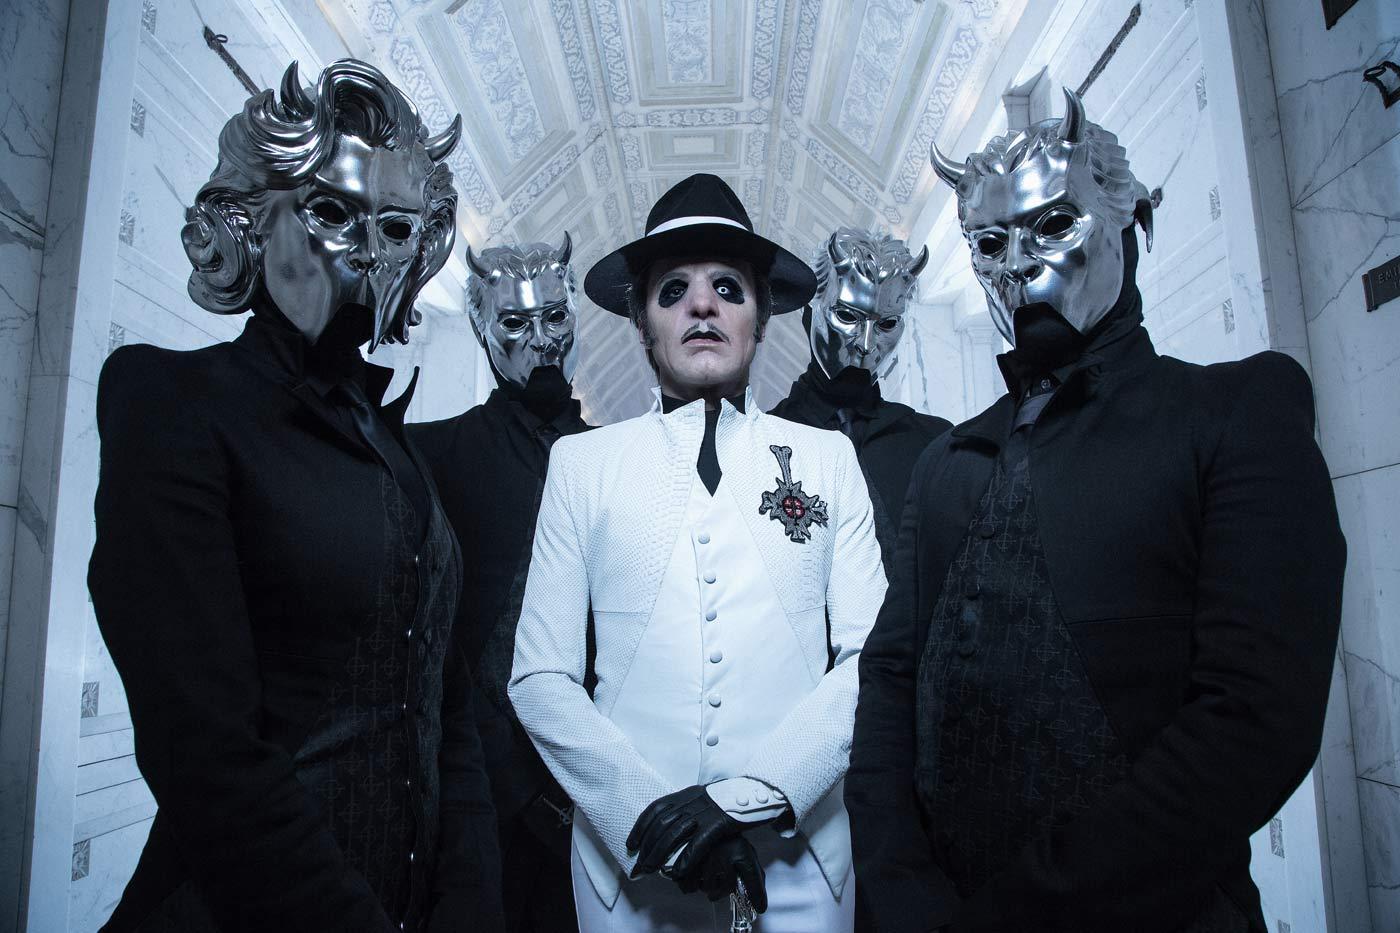 Nueva gira de Ghost junto a Tribulation y All Them Witches